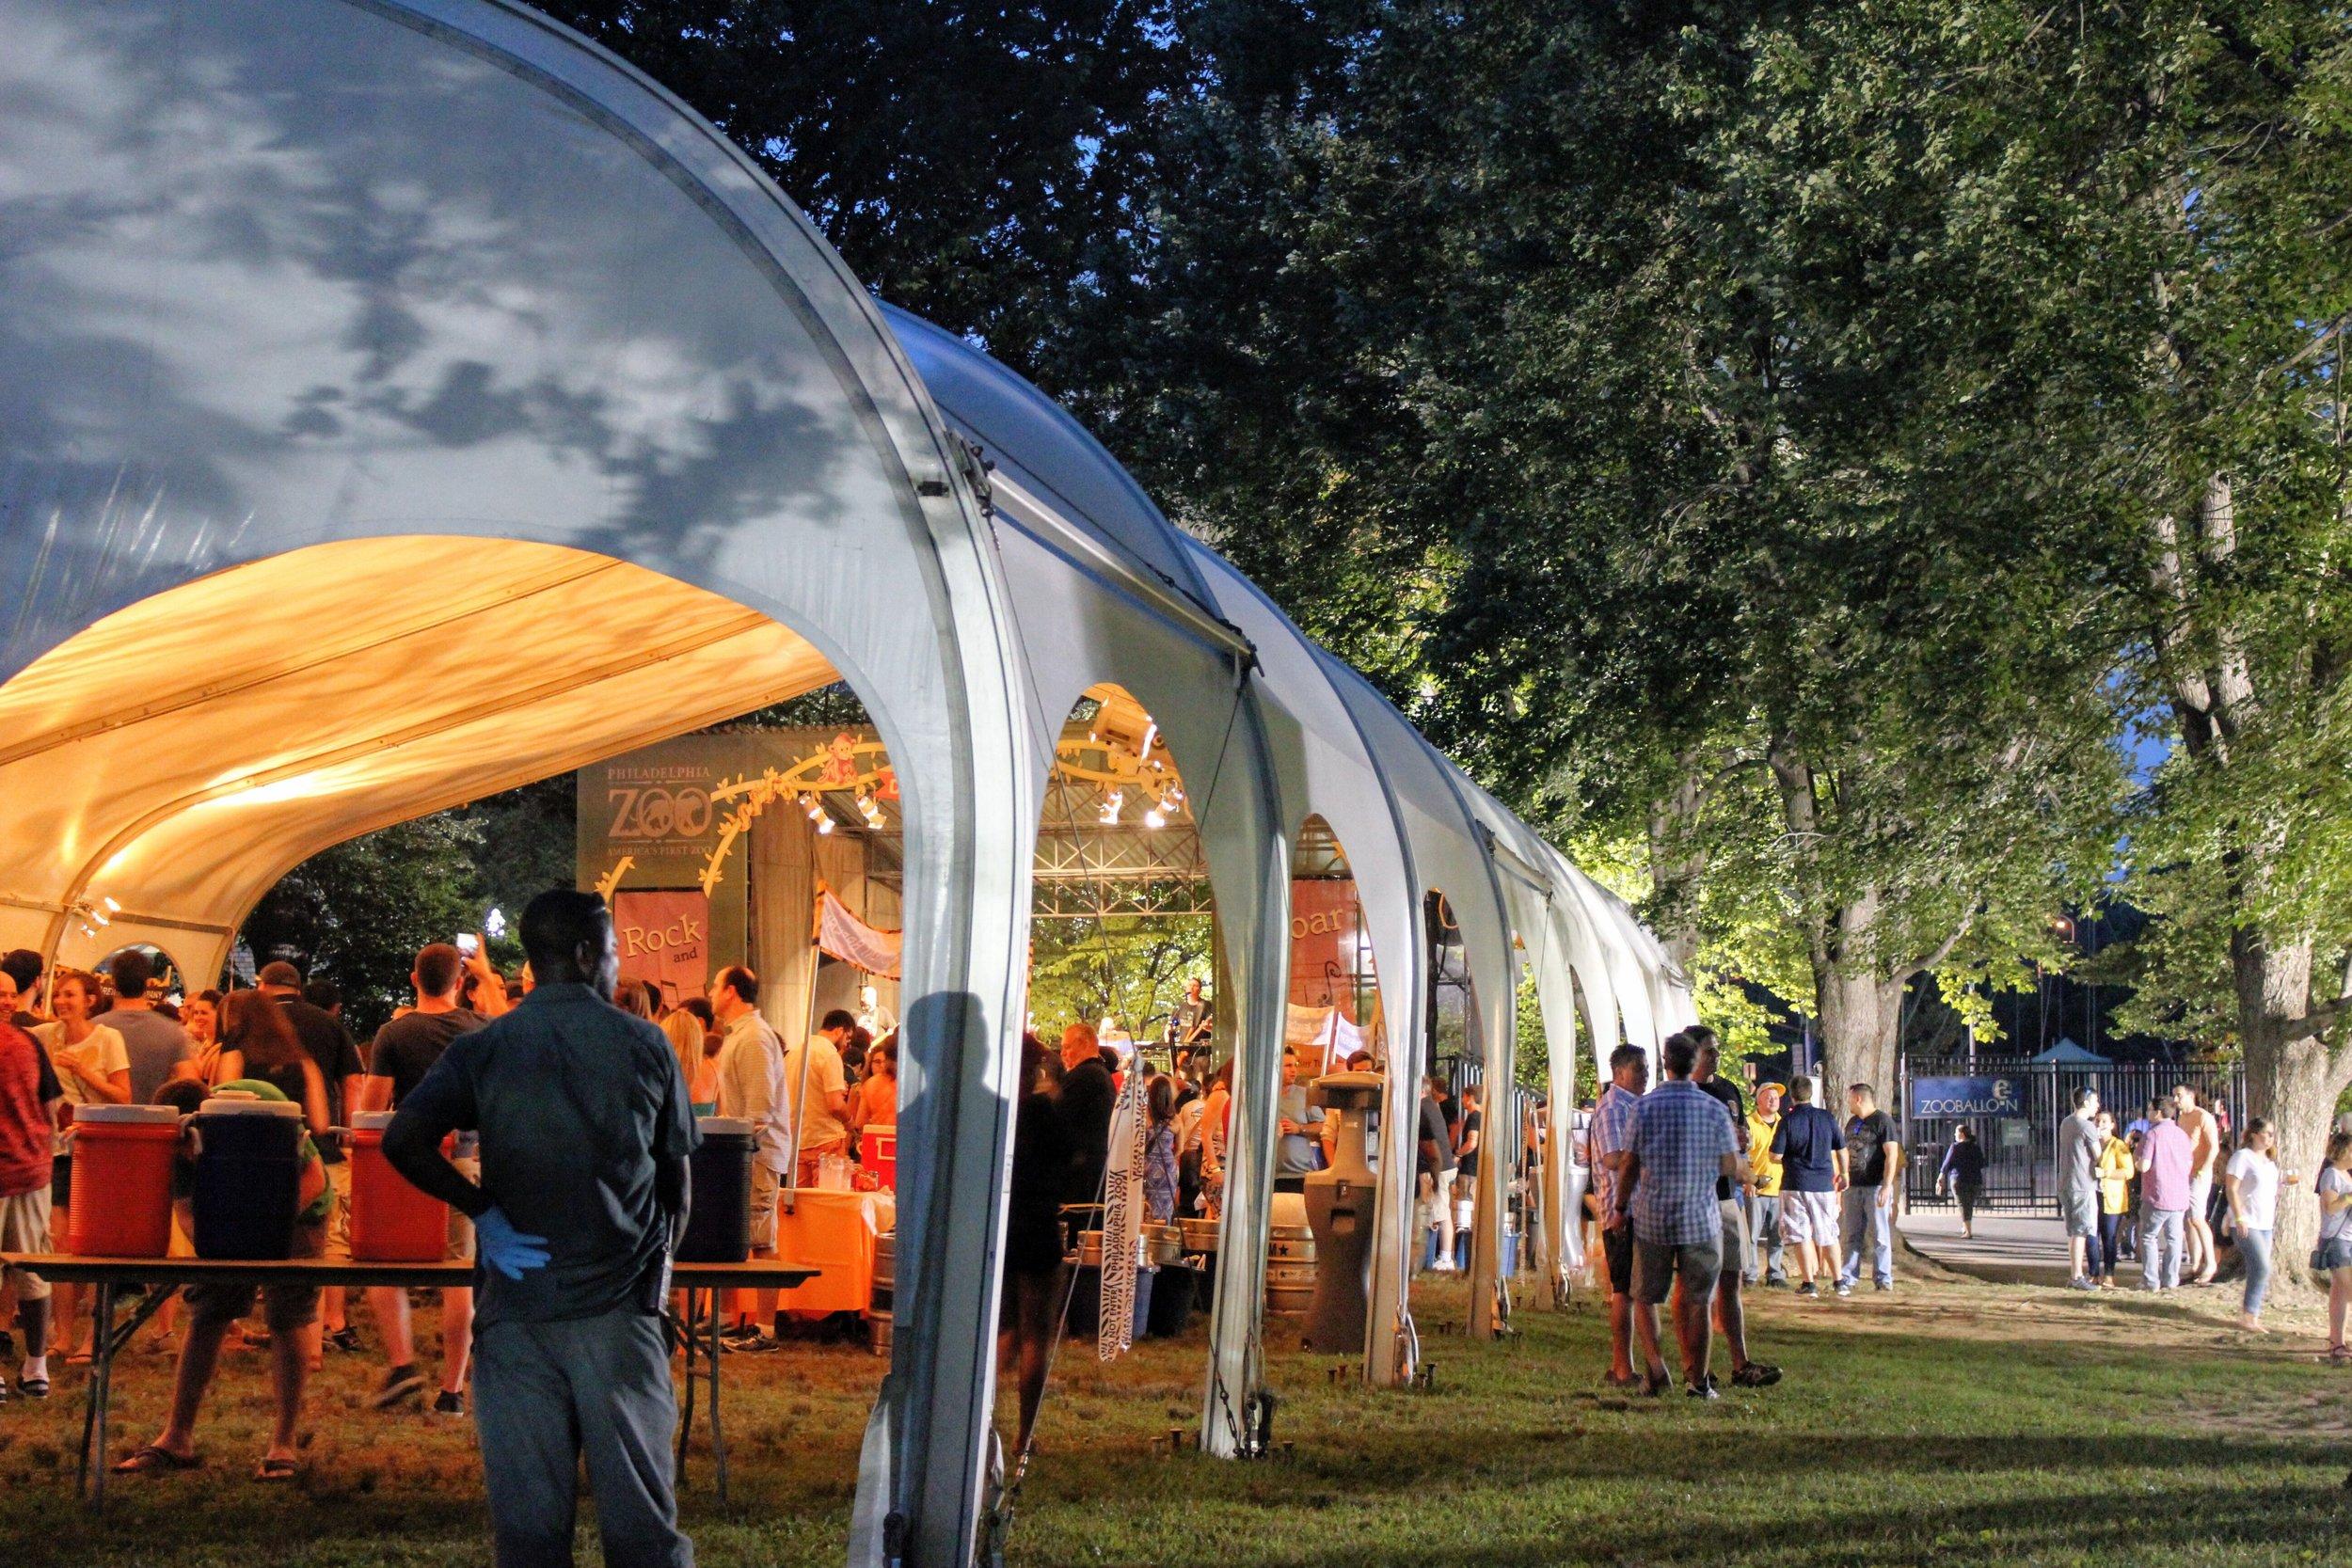 Philadelphia Zoo Summer Ale Fest